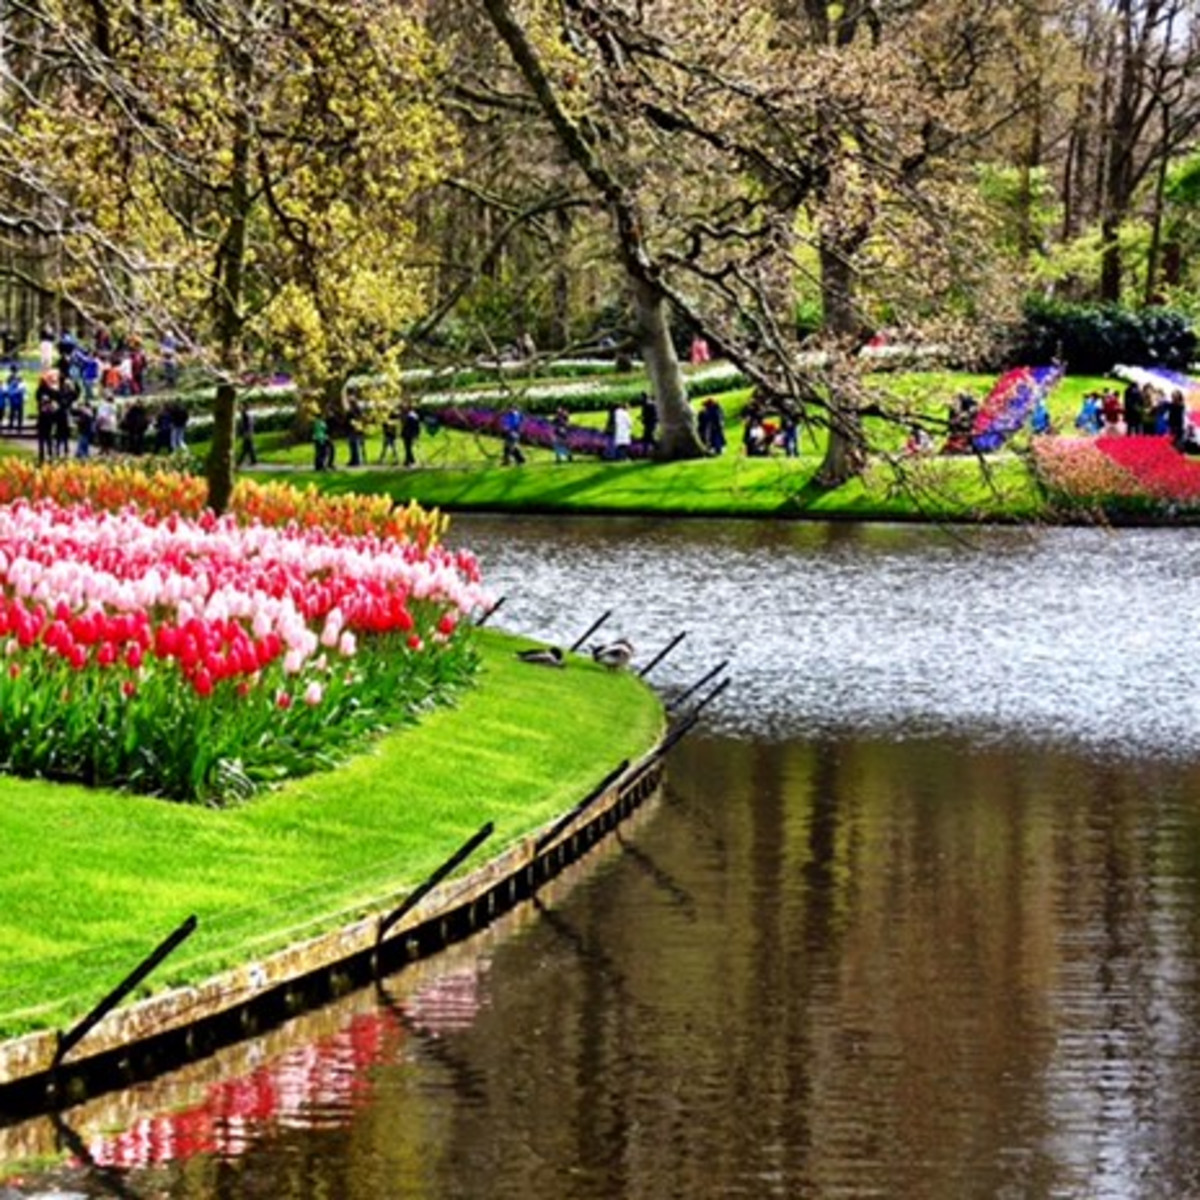 Tulip Amsterdam Keukenhof: 50 Hours In Amsterdam: Why Tiptoe Through Tulips When You